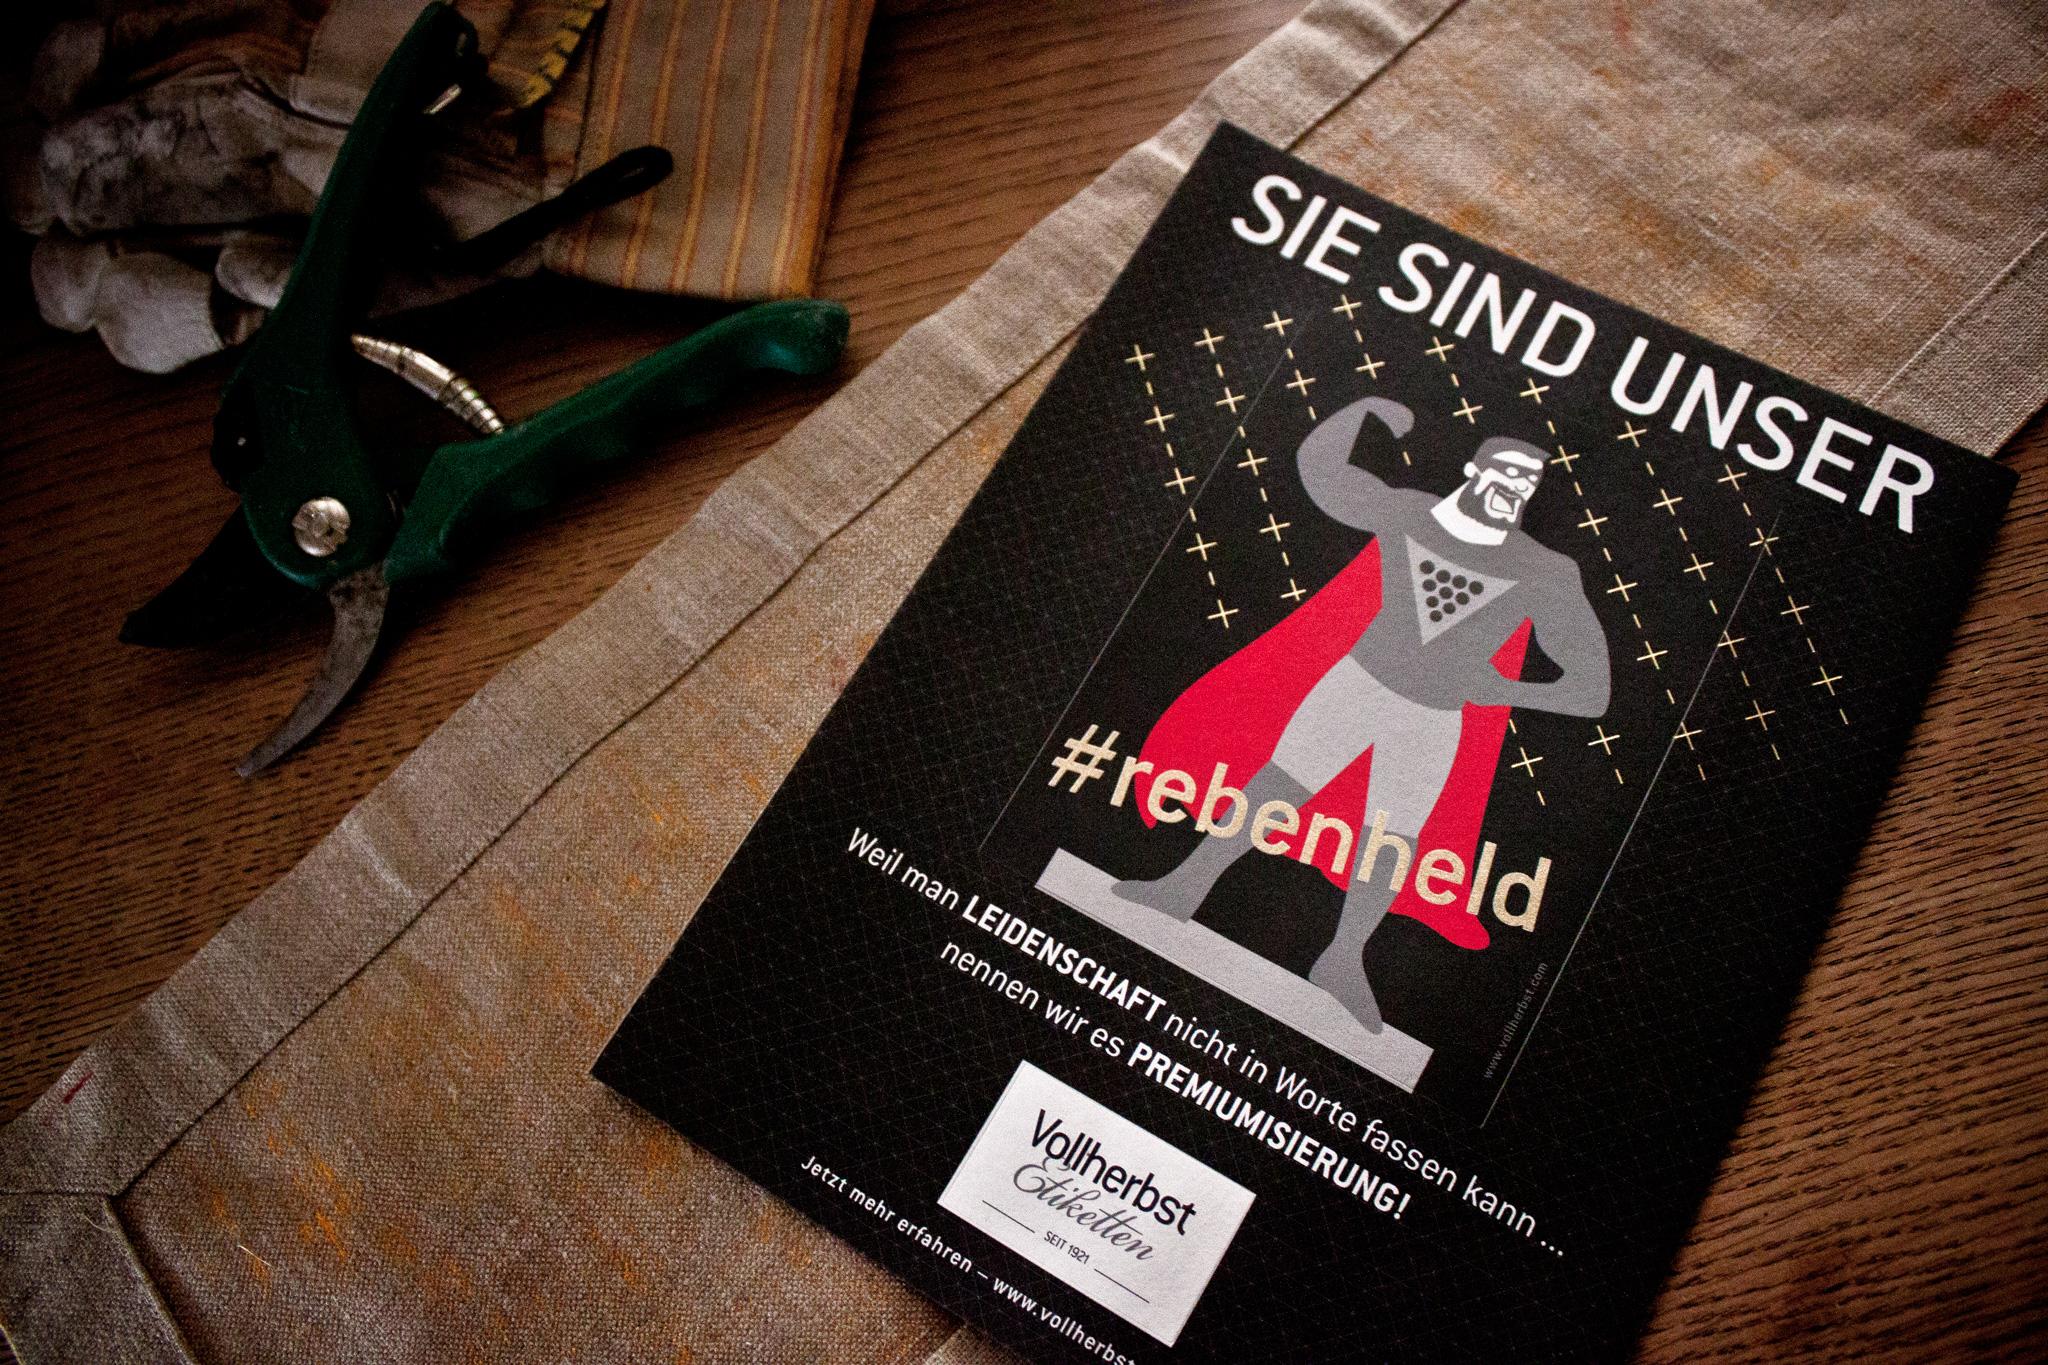 #Rebenheld